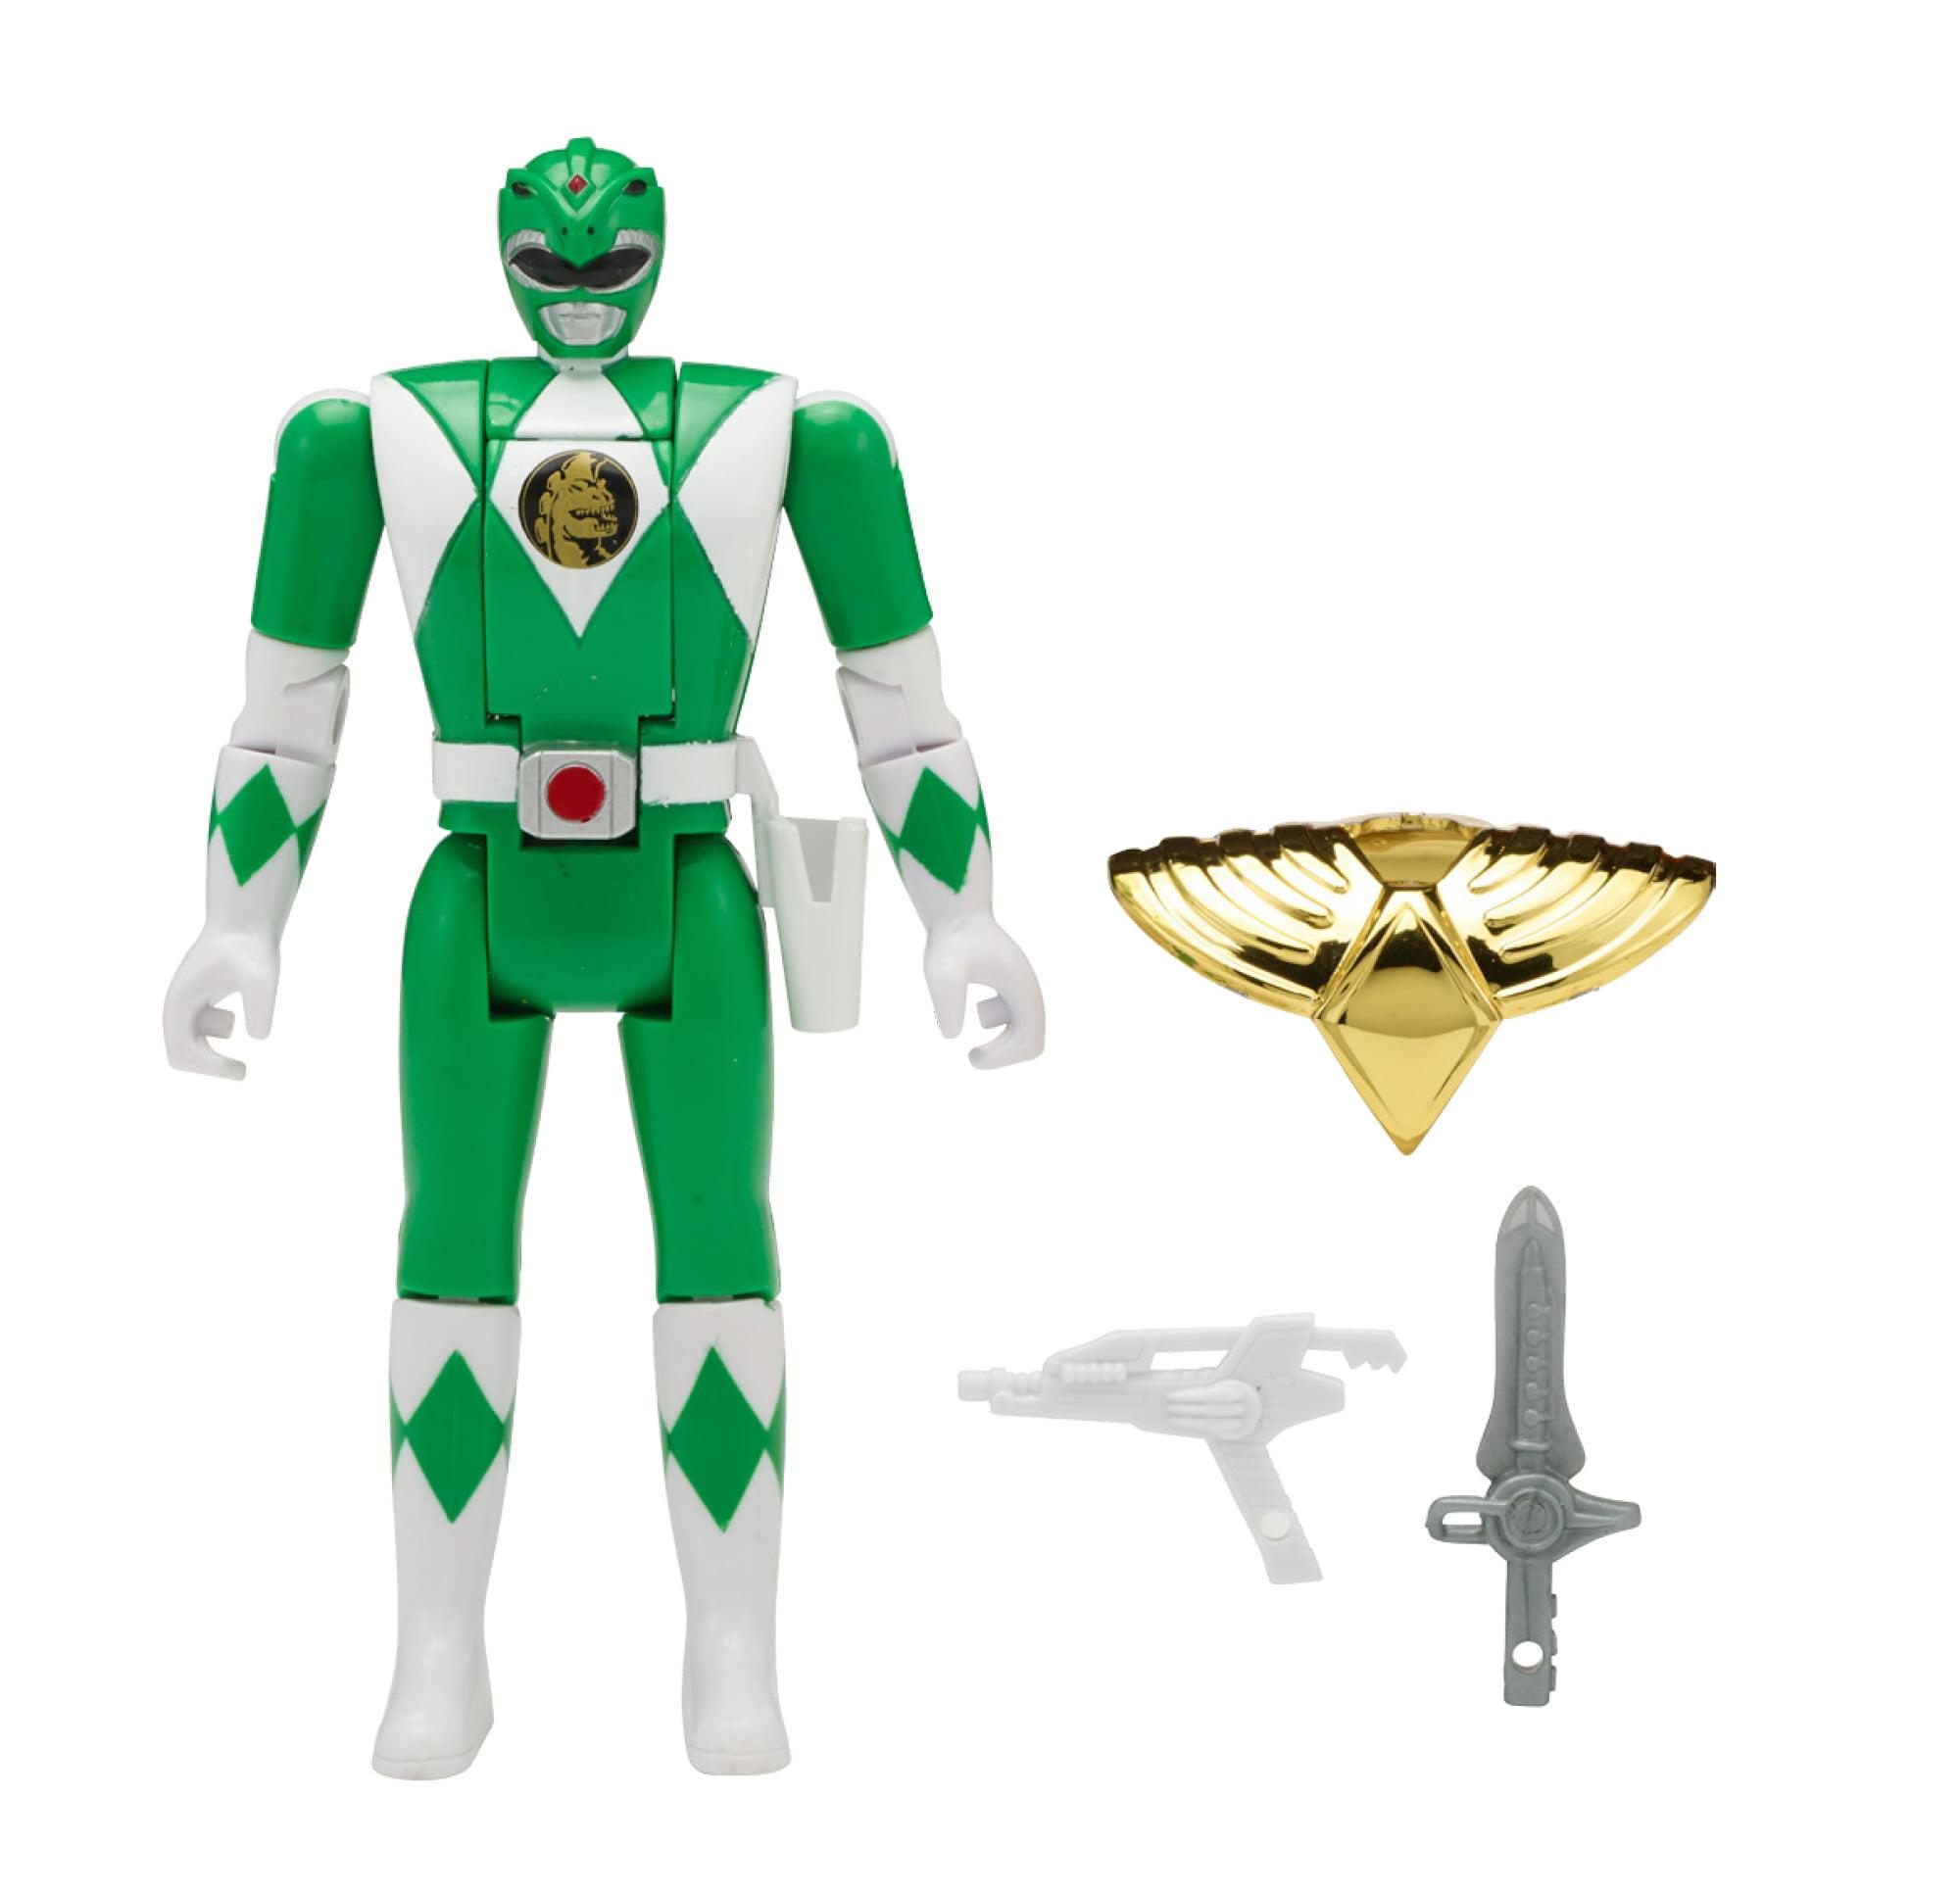 Bandai Power Rangers Mighty Morphin Head Morph Figure, Green Ranger by Bandai America